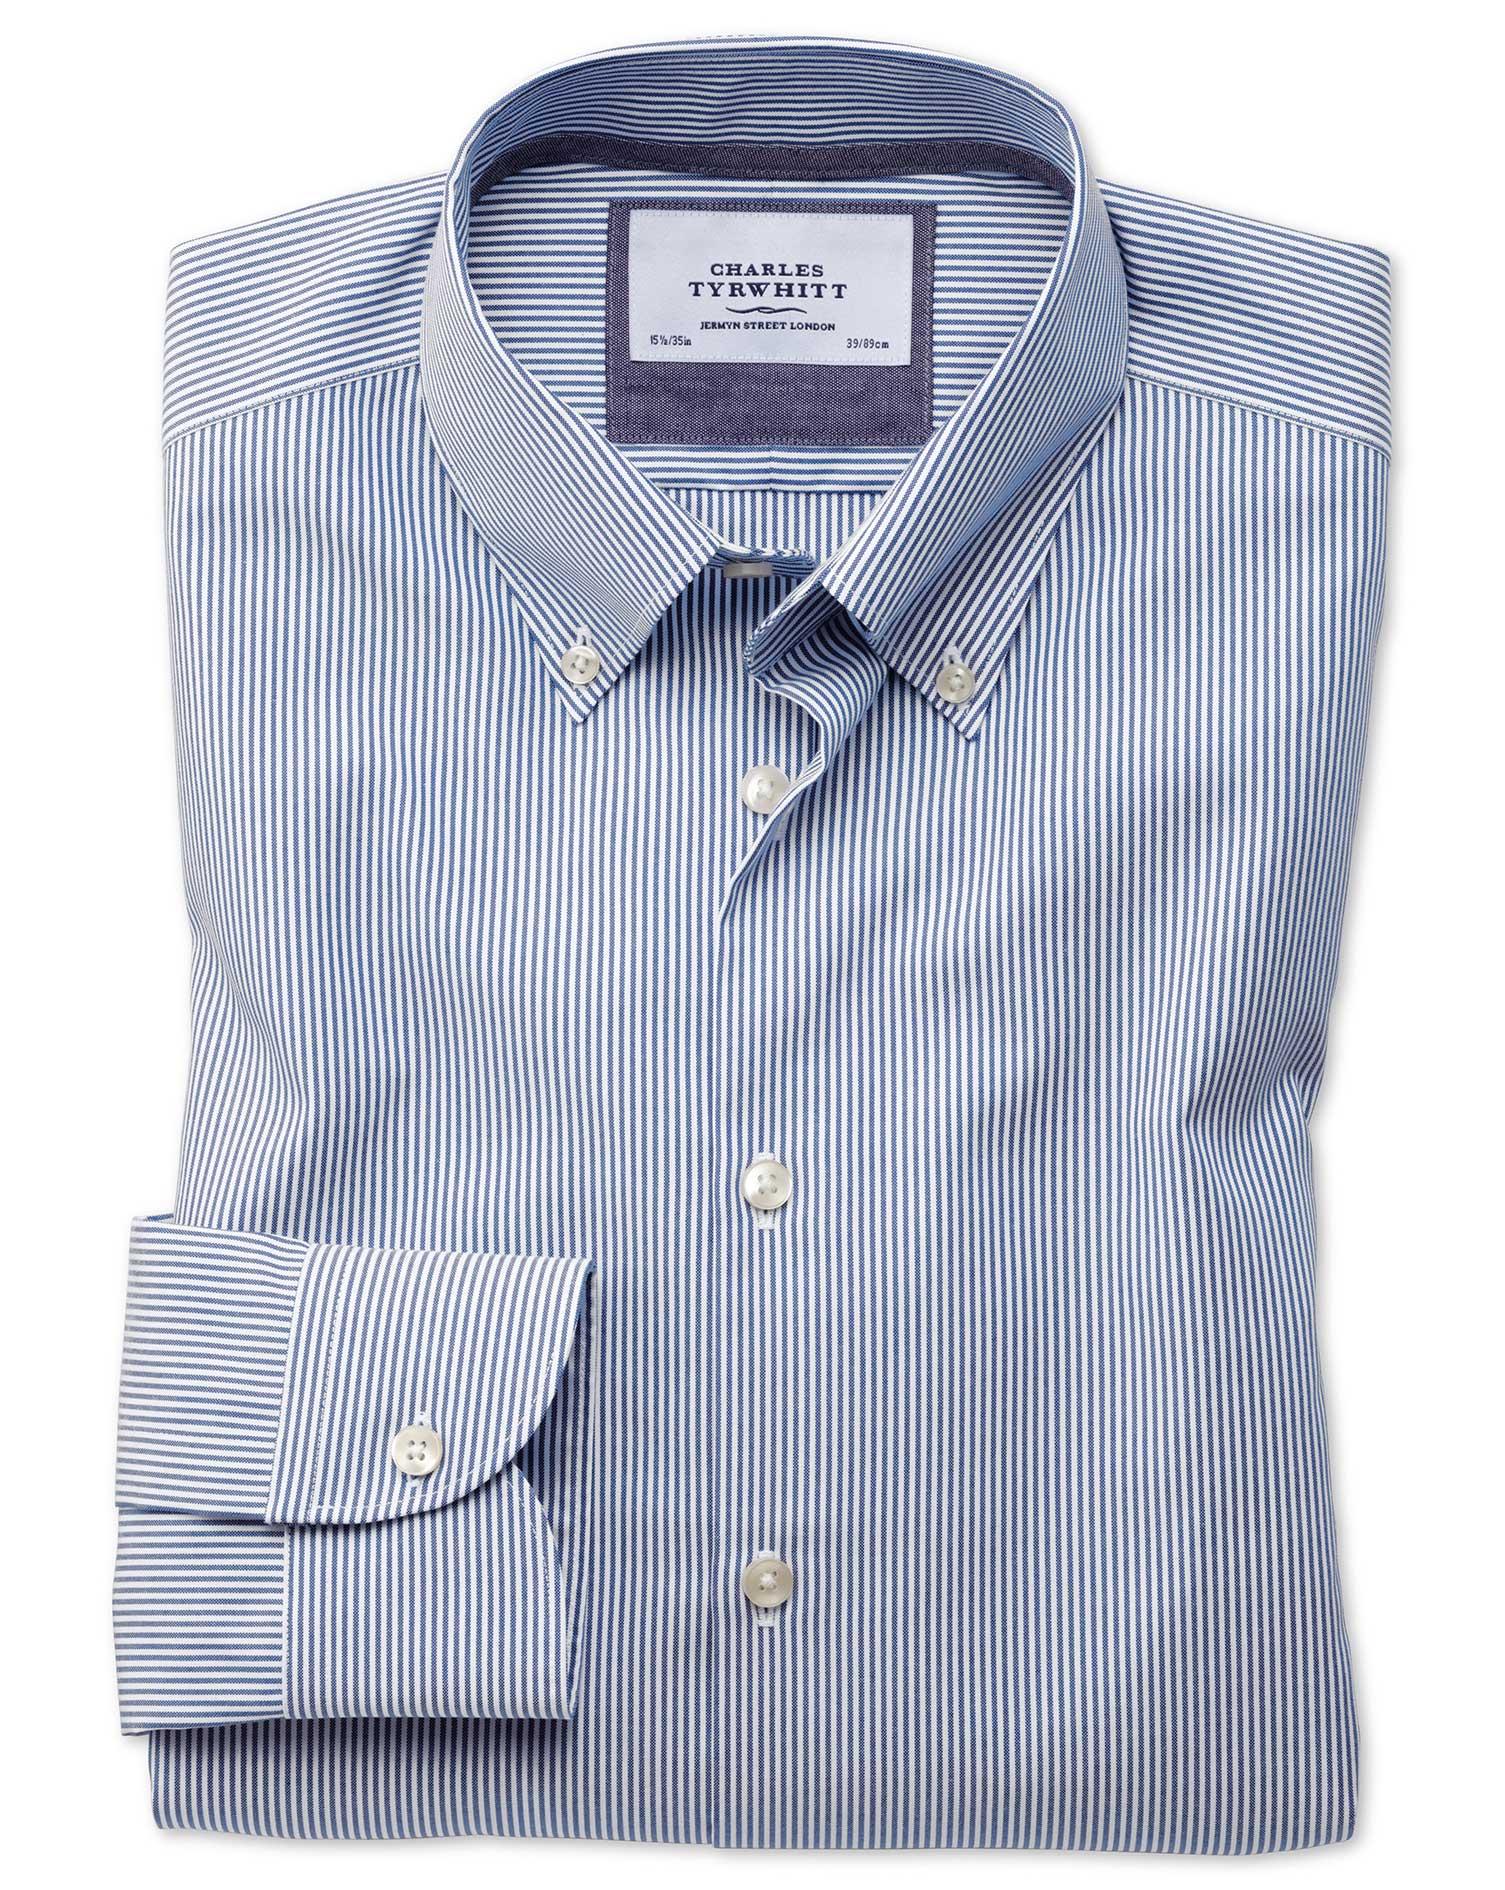 Slim Fit Button-Down Business Casual Non-Iron Blue Stripe Cotton Formal Shirt Single Cuff Size 16/34